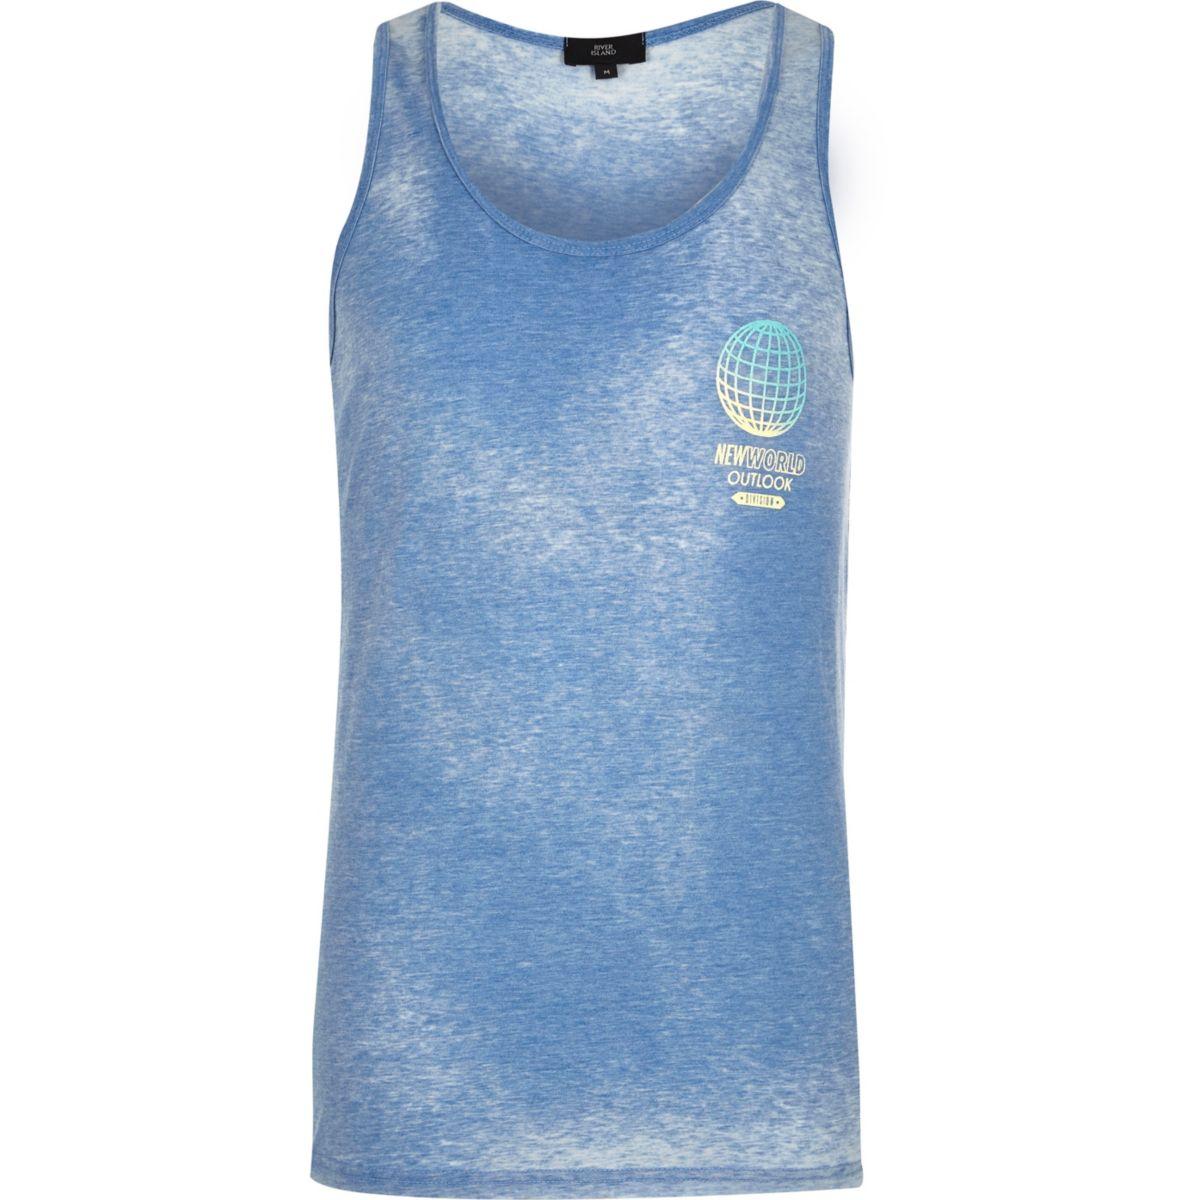 Blauw hemdje met 'New World'-print